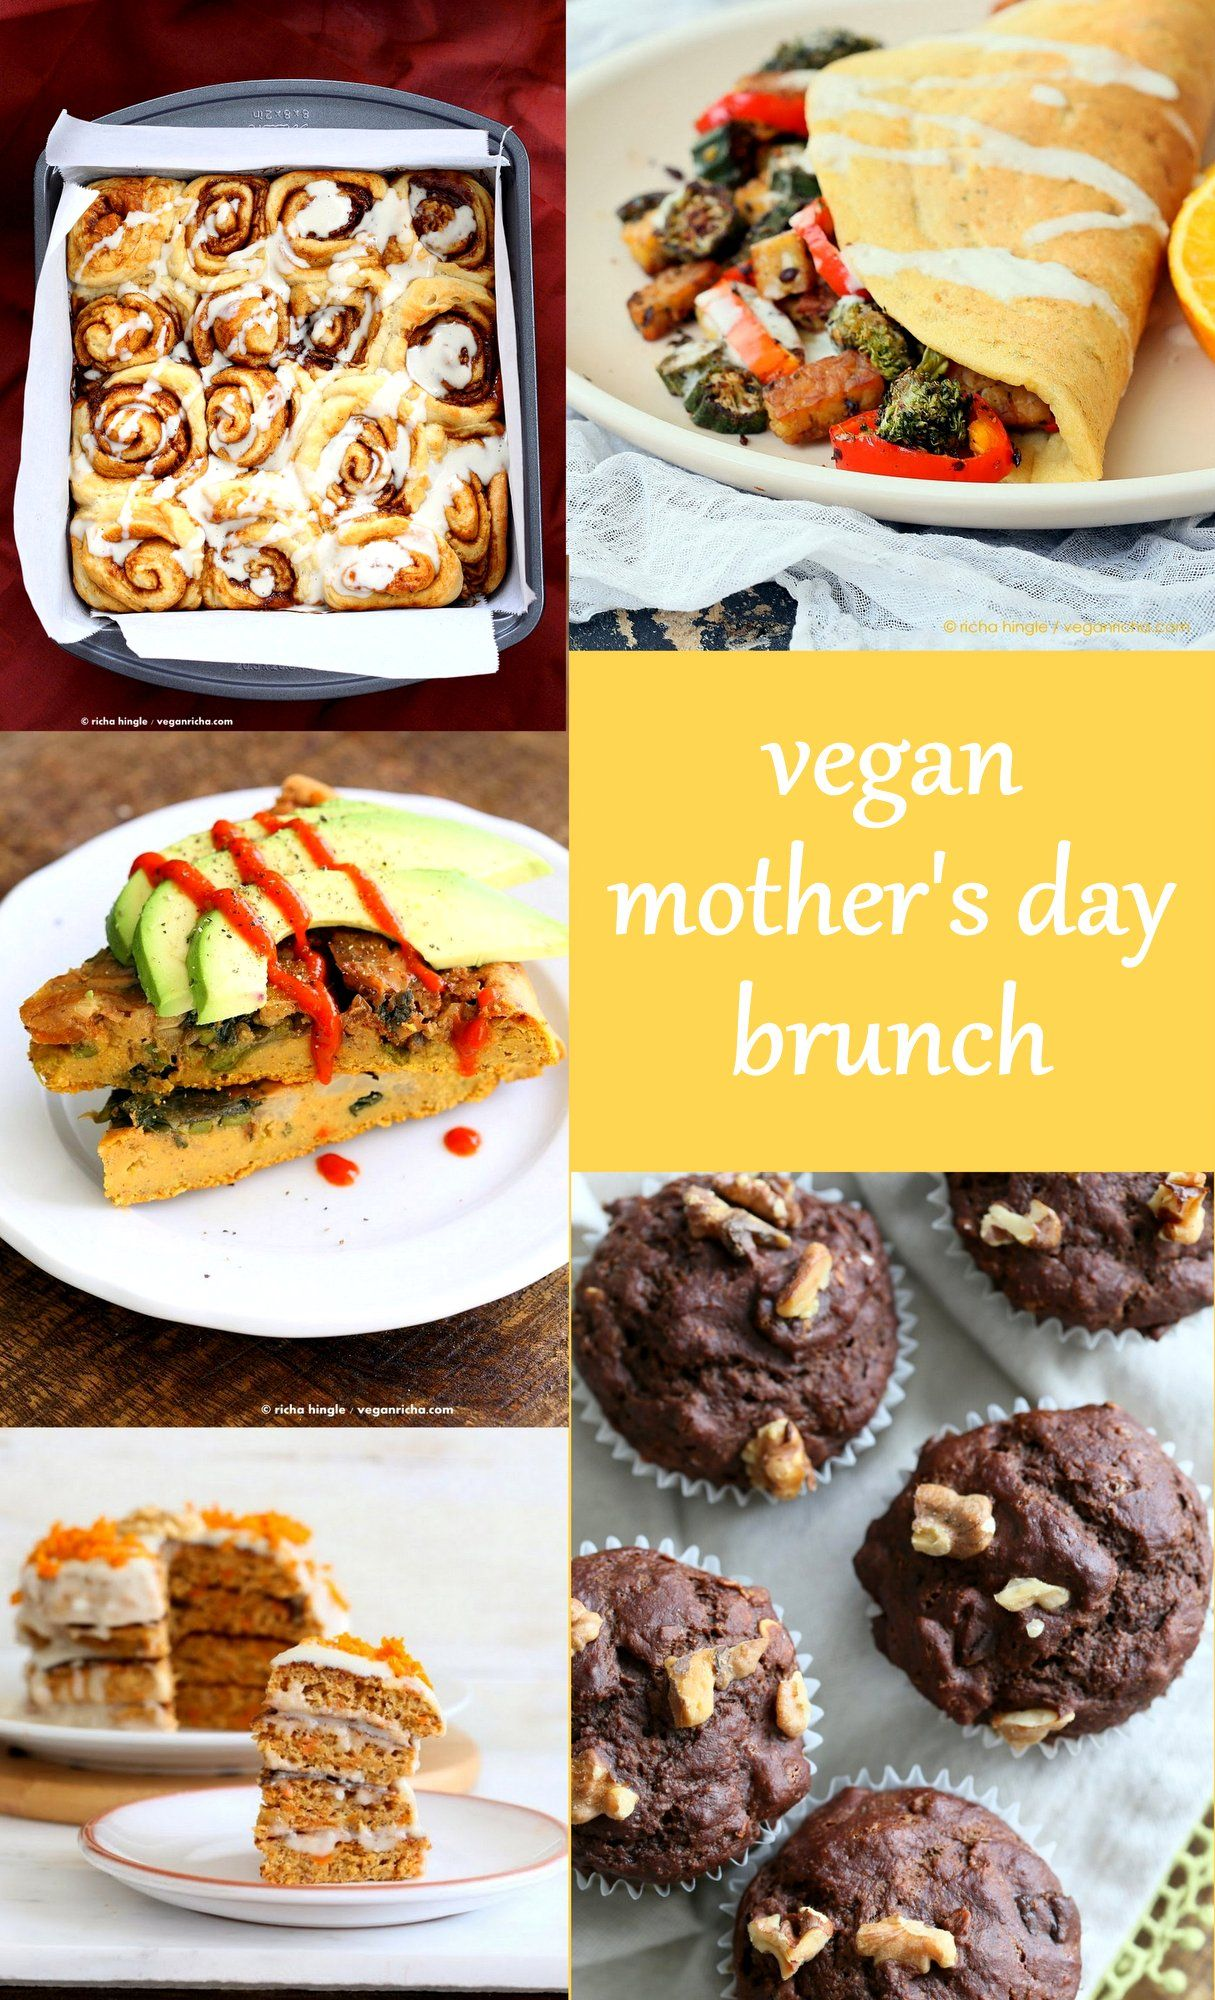 35 Vegan Mother S Day Brunch Recipes Vegan Richa Vegan Brunch Recipes Vegan Brunch Brunch Casserole Recipes